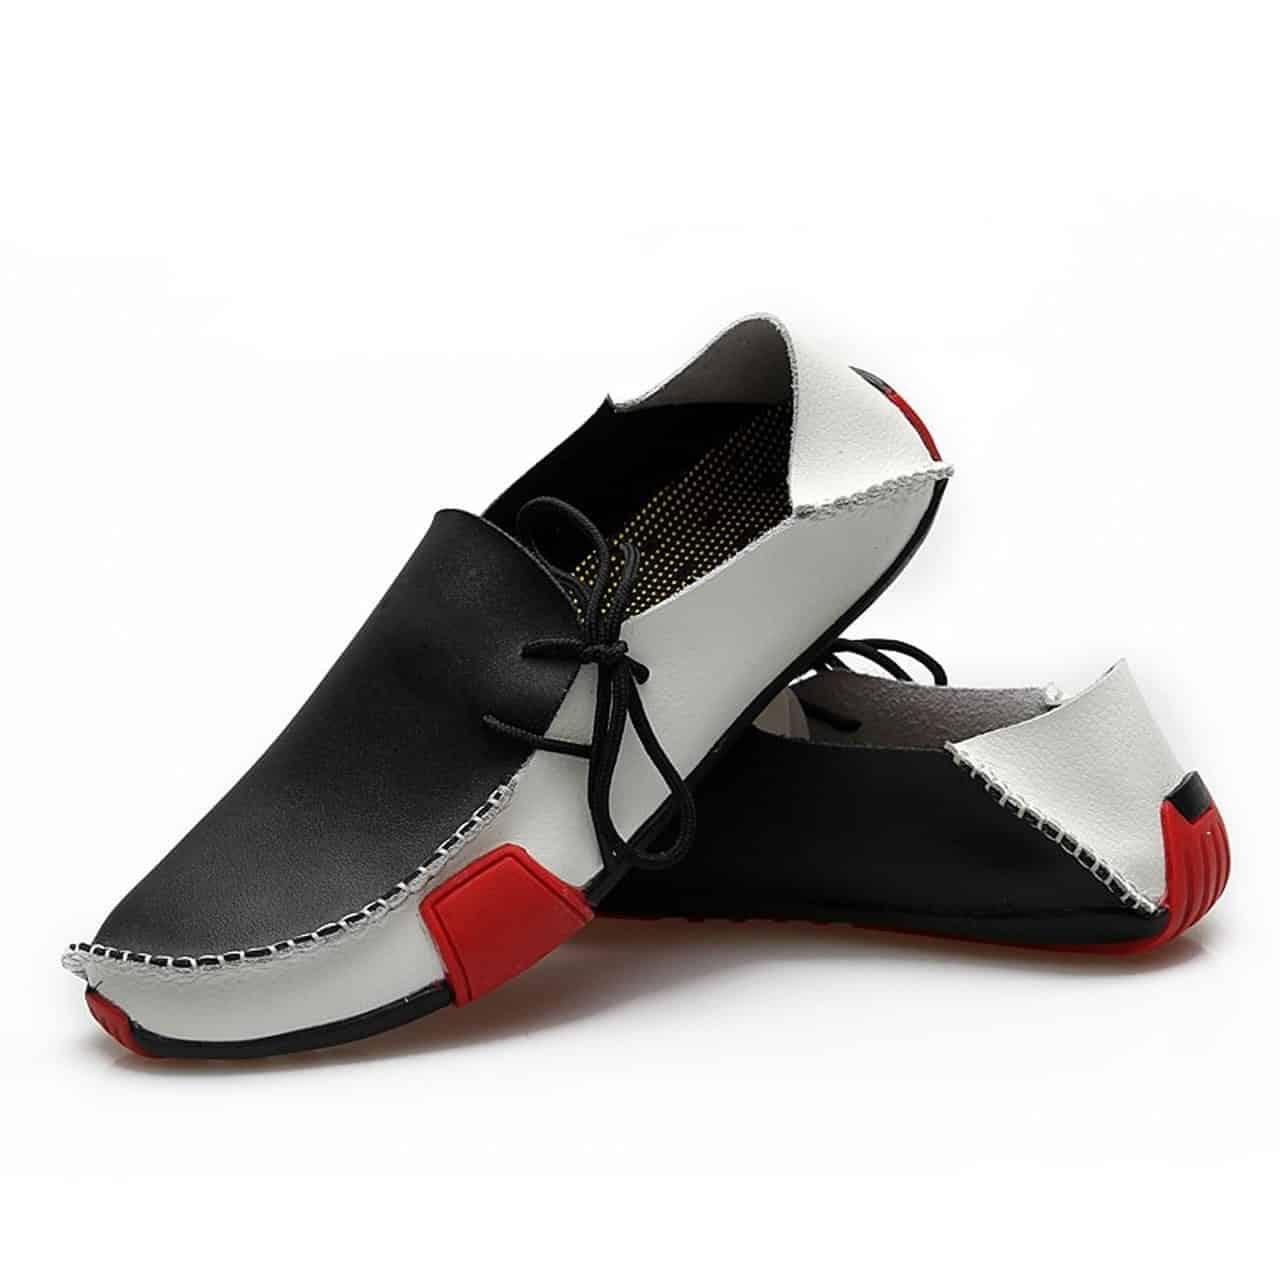 Sepatu-Fantofel-Pinsv-Slip-On-Shoes